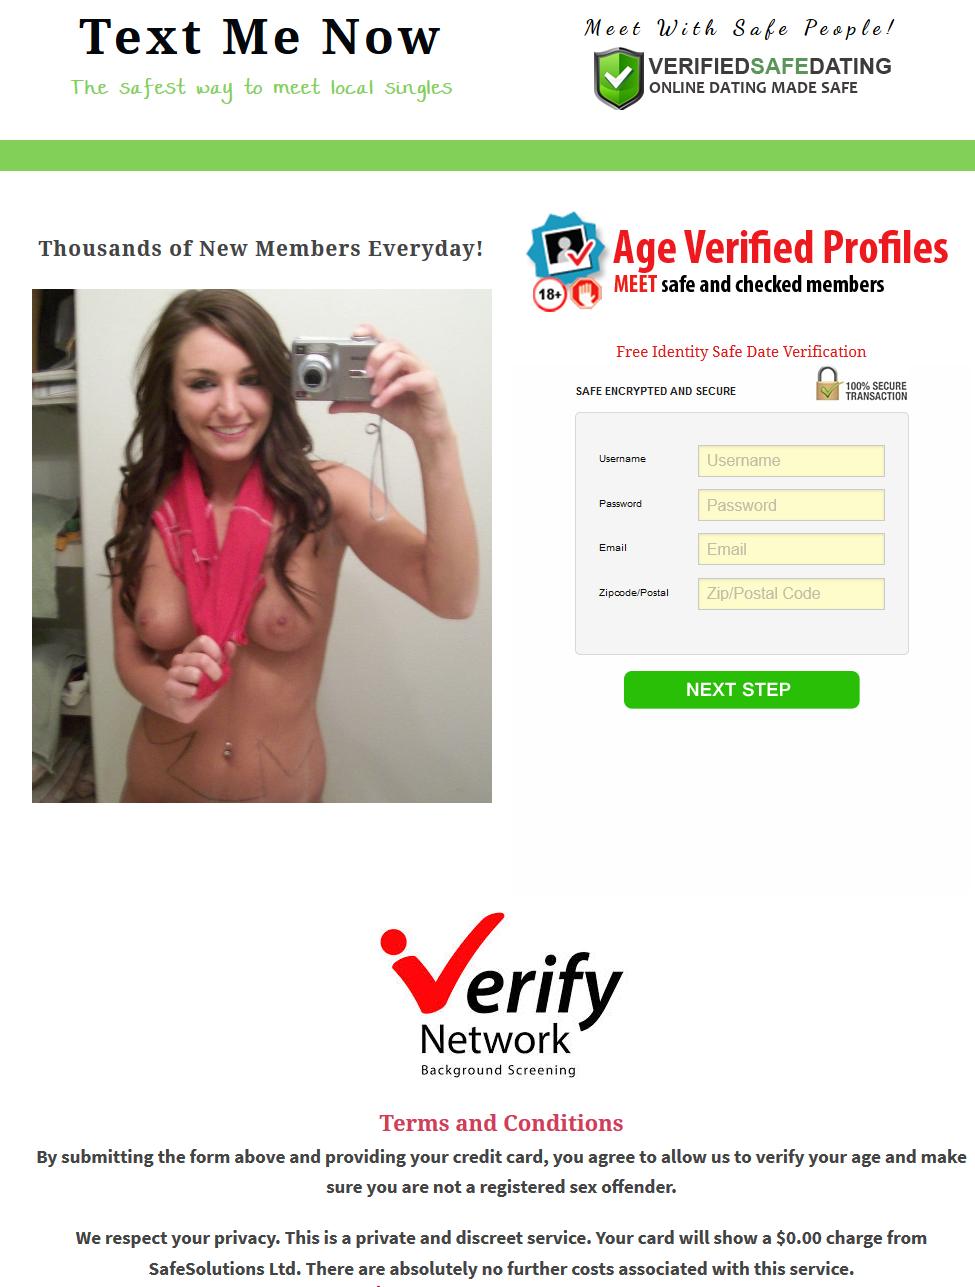 meet me app scams on craigslist